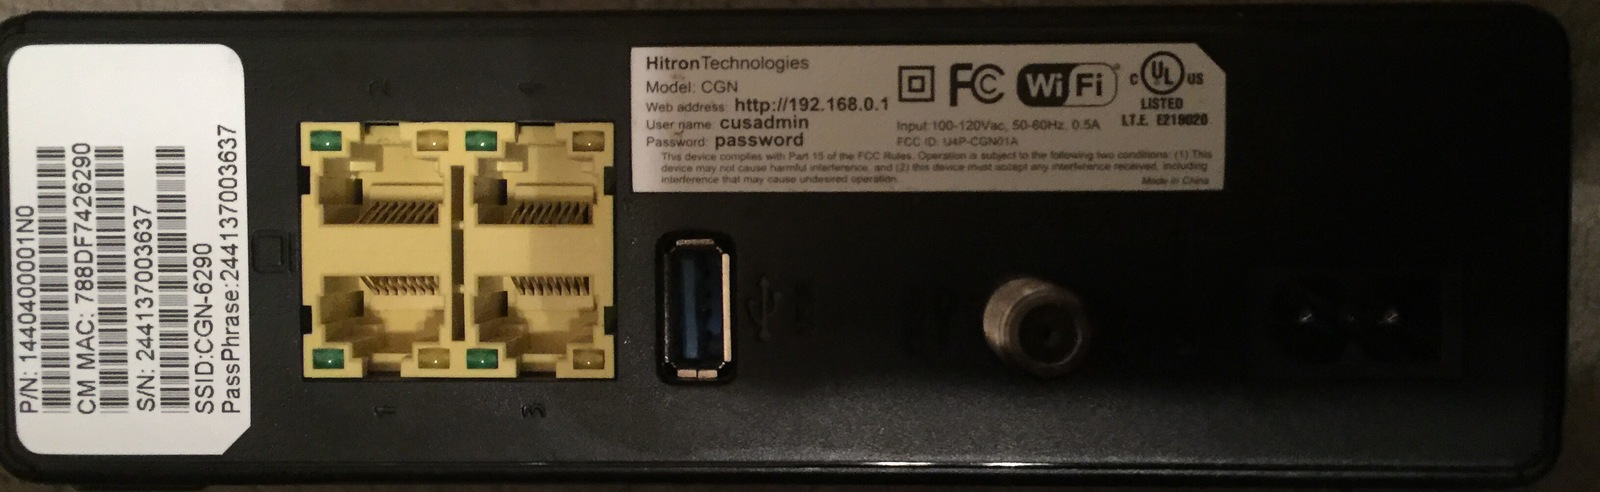 Hitron Technologies CGN Wireless Modem and 50 similar items